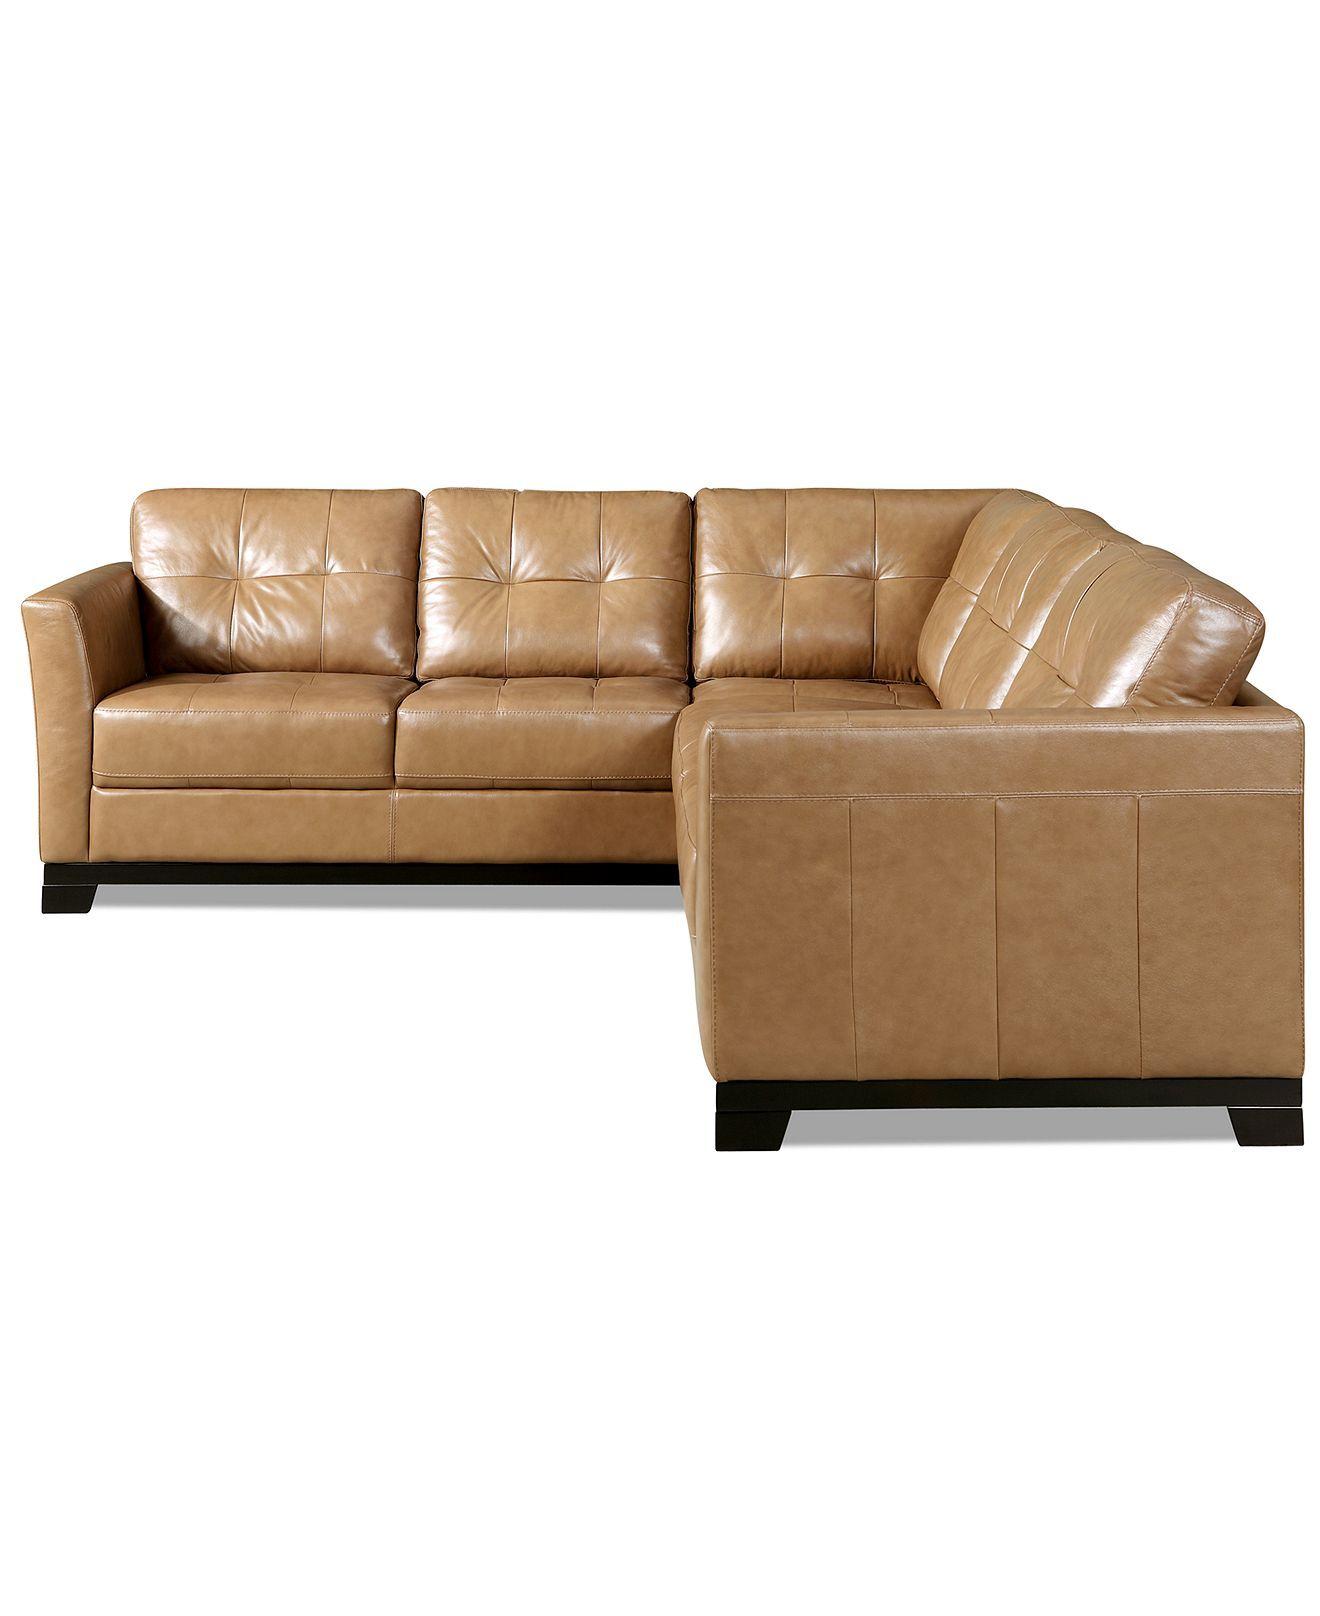 Martino Leather 2 Piece Sectional Sofa Sofa and Apartment Sofa